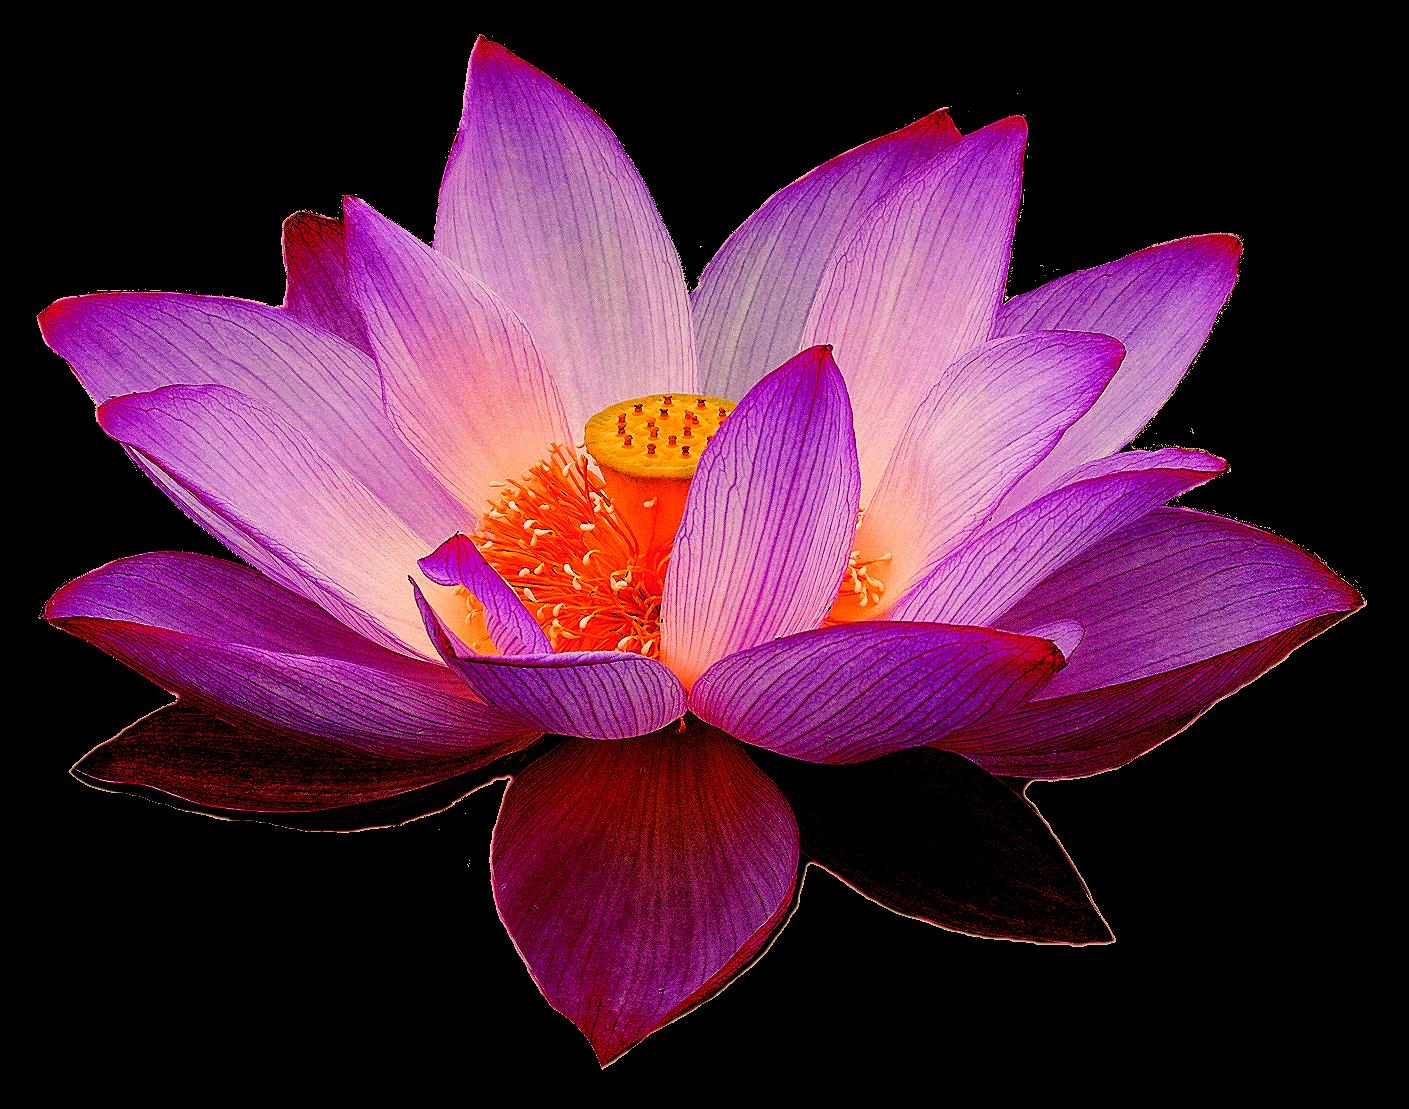 Lotus flower png. Nelumbo nucifera yoga fit